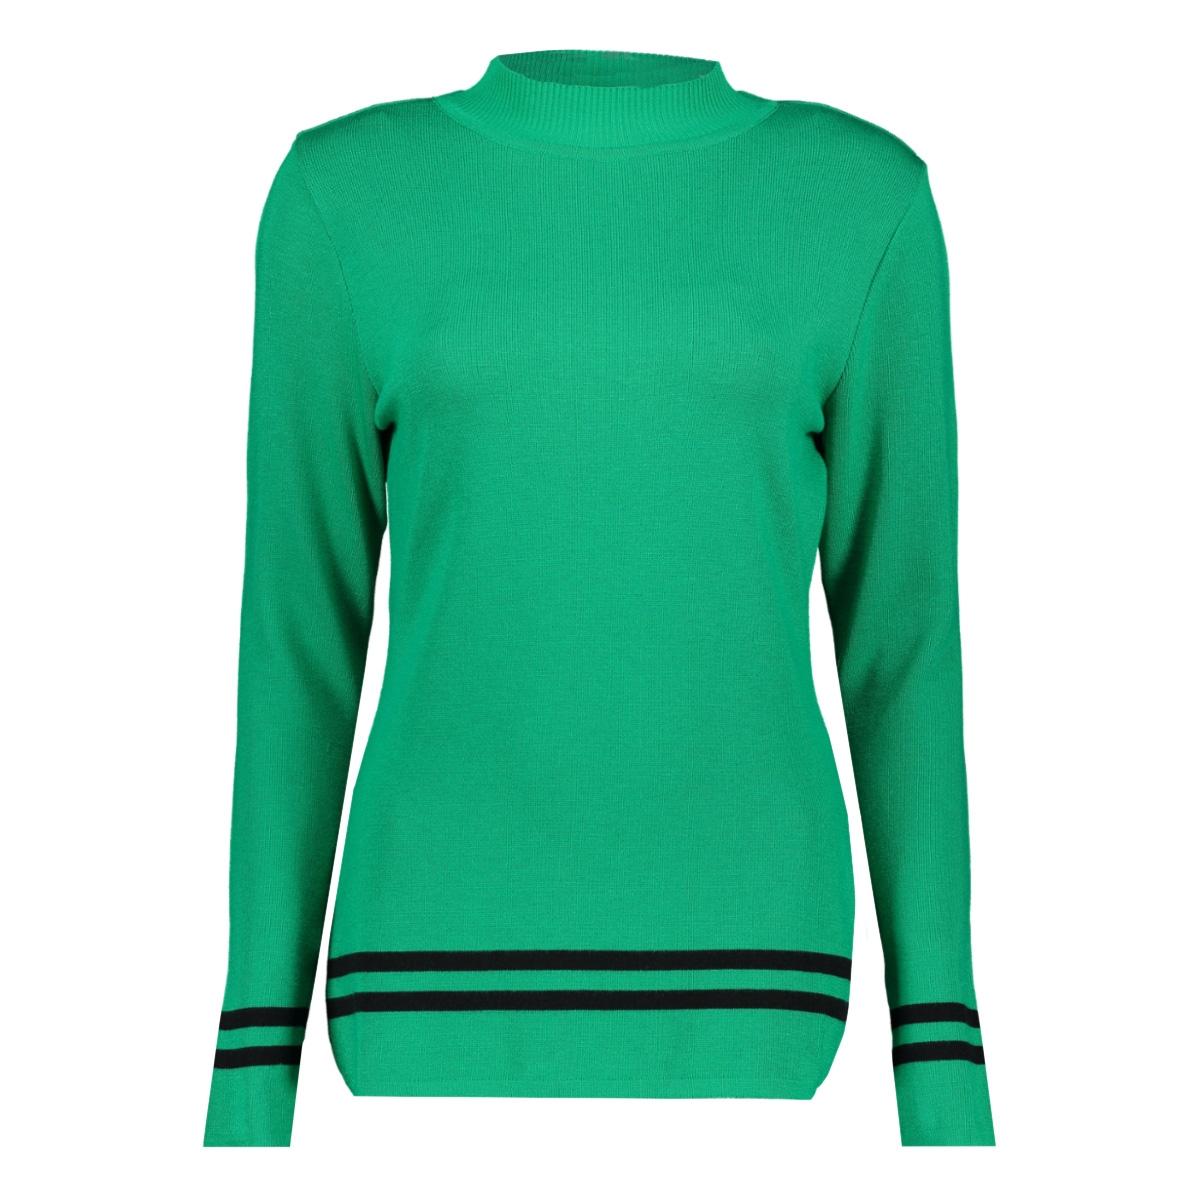 kelly 2 sweater zoso trui green/black